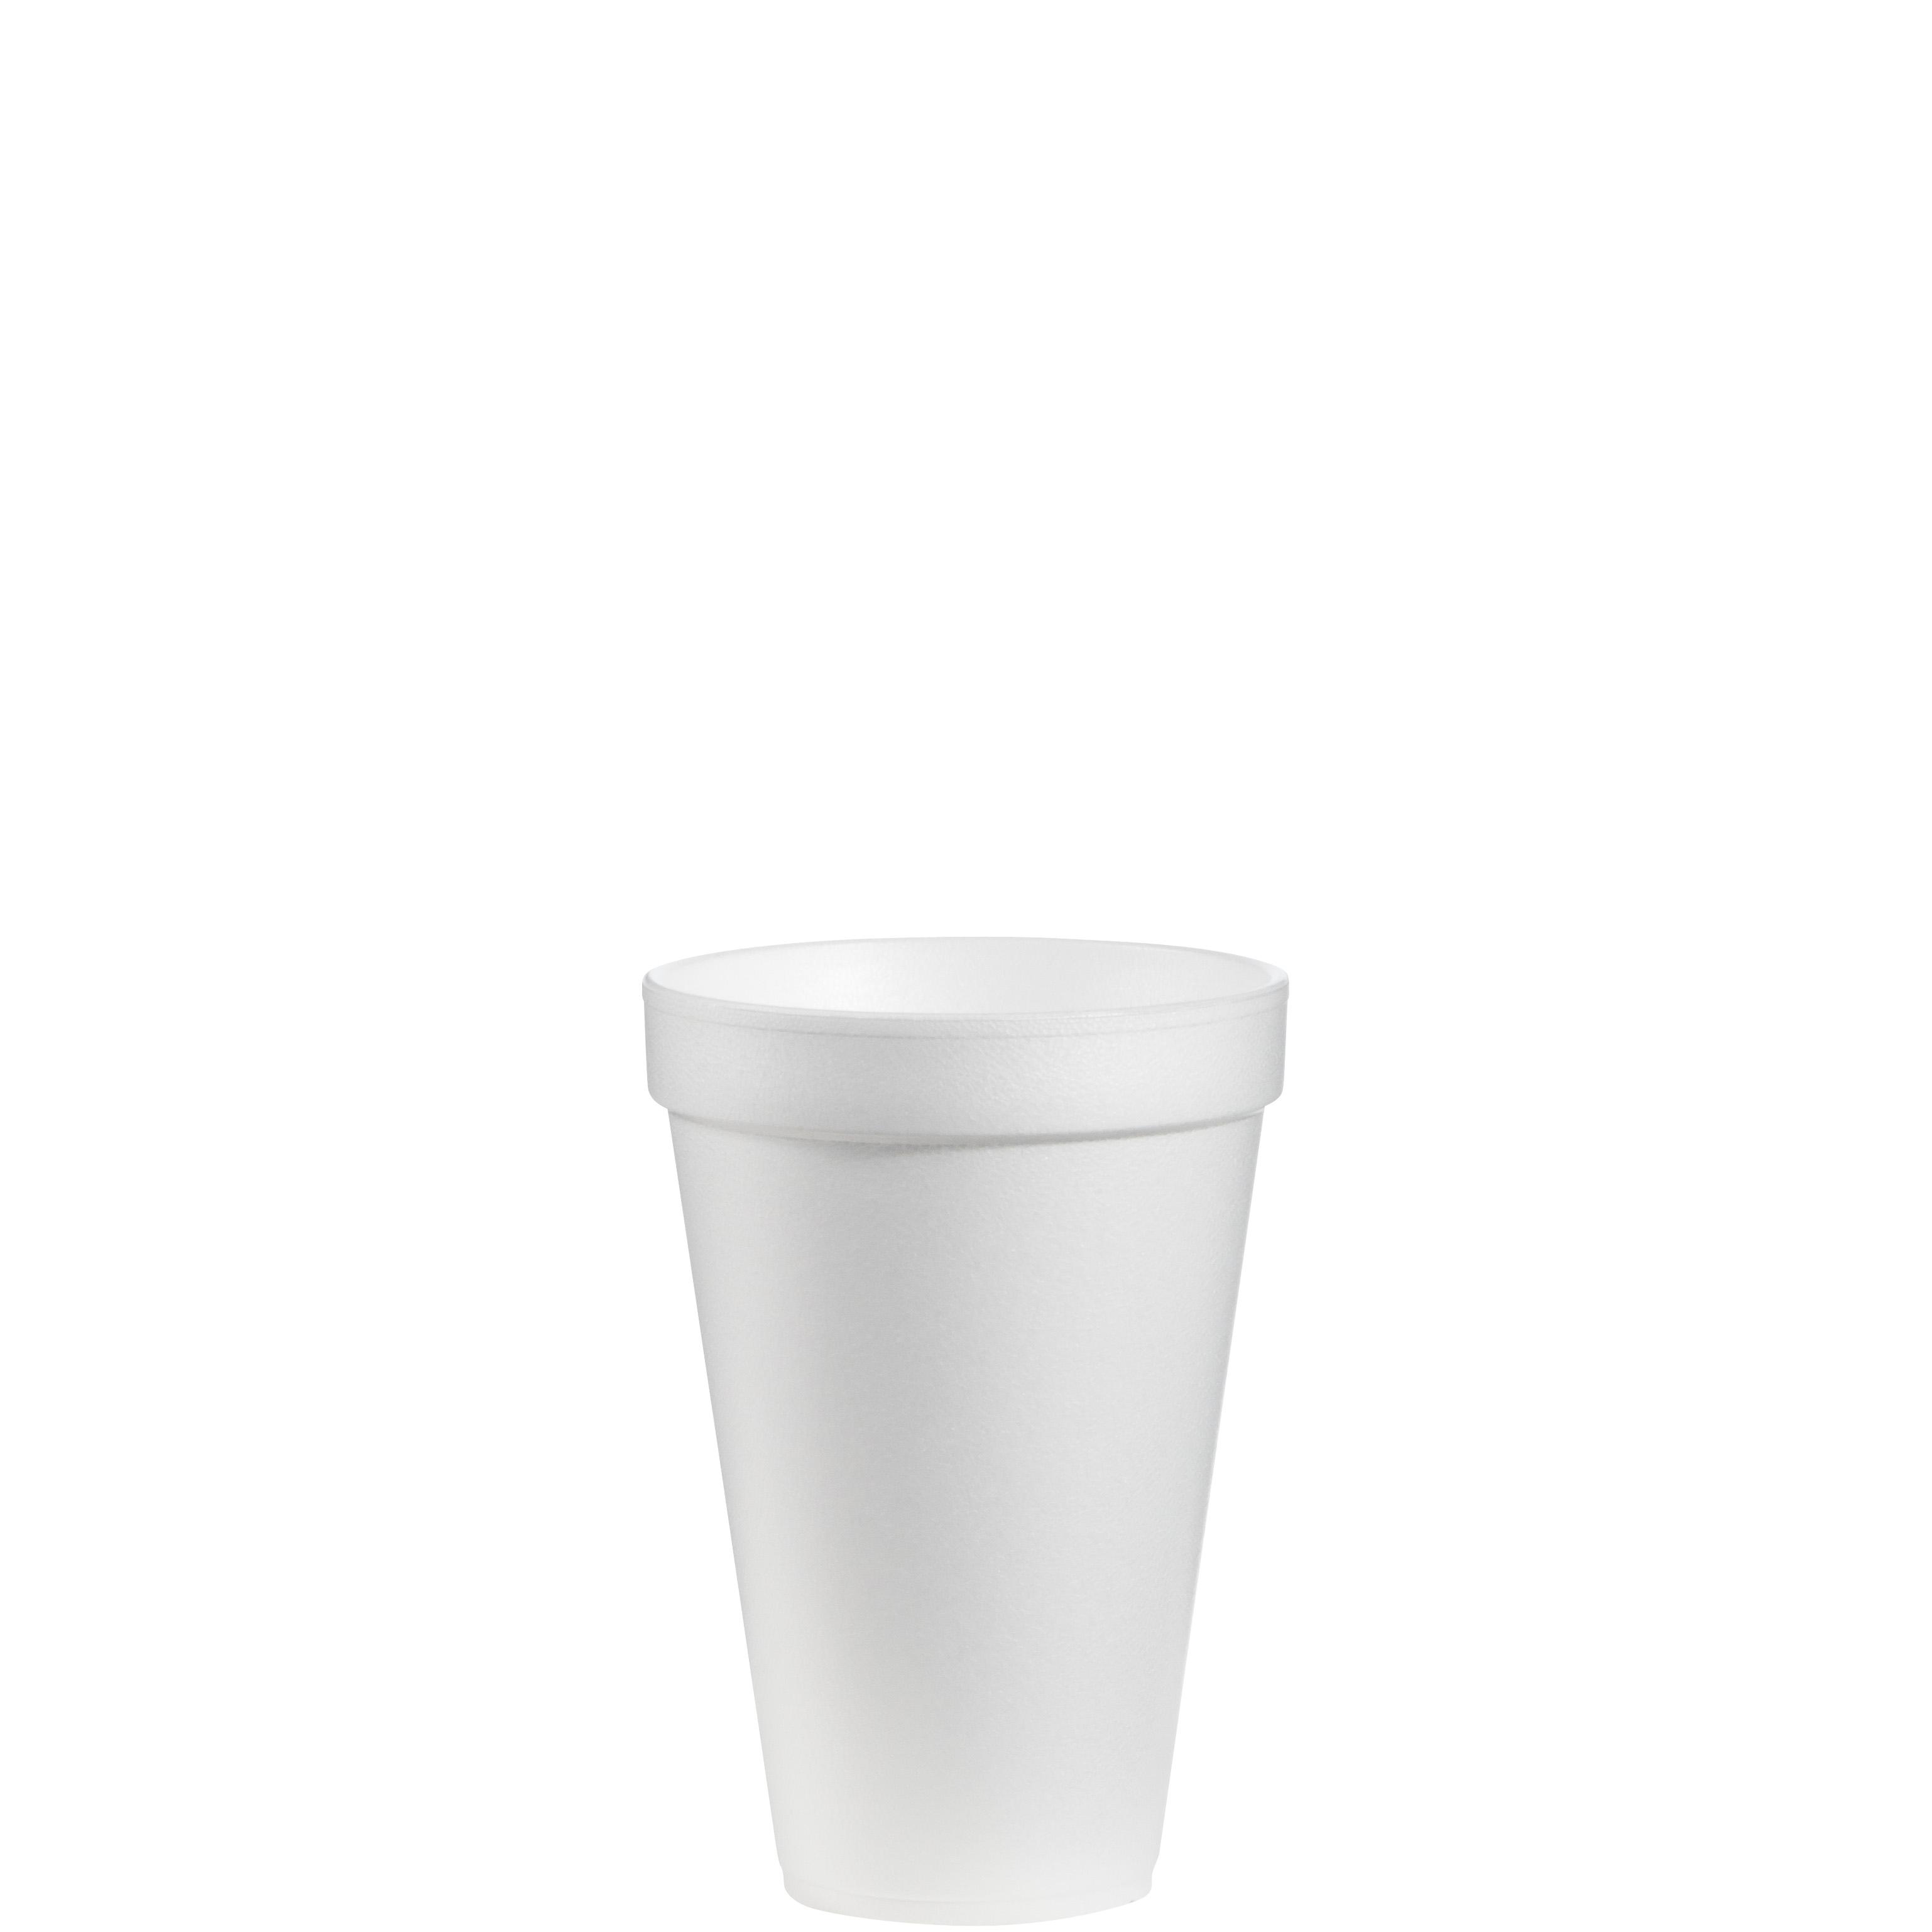 14 OZ FOAM CUP